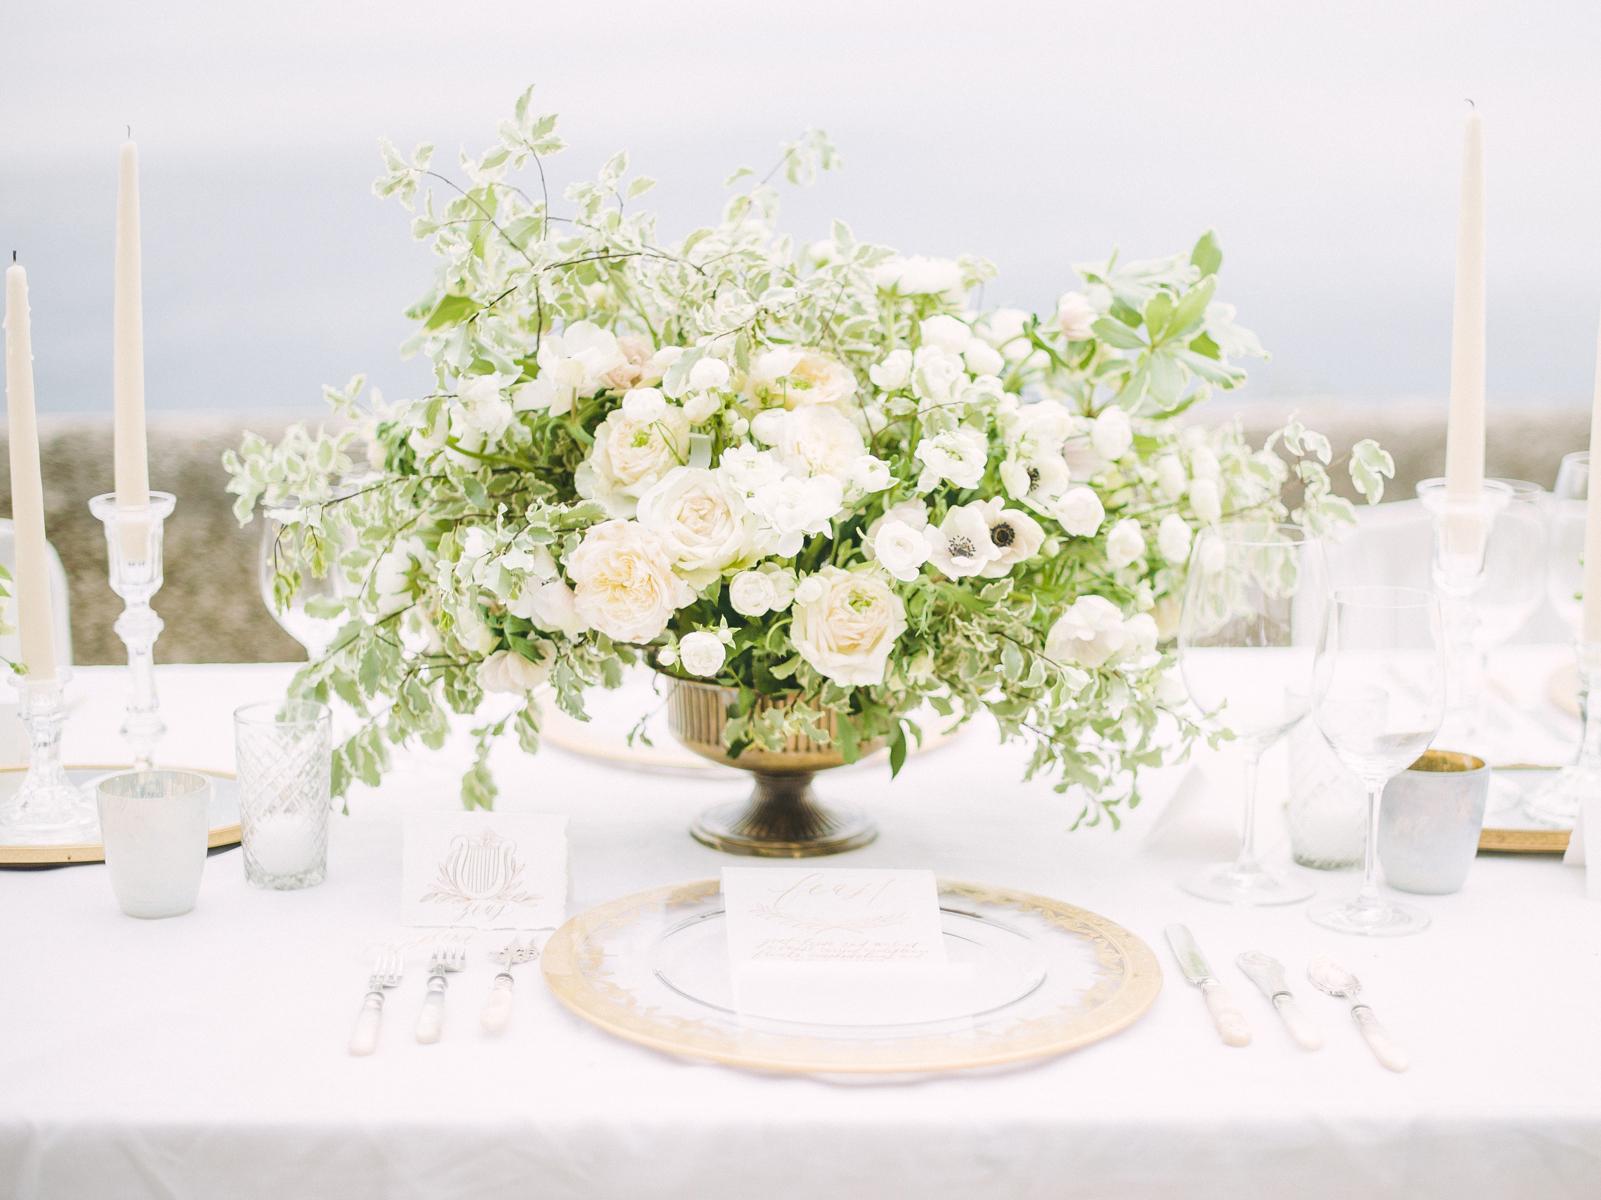 Boheme-Moon-wedding-photography-ravello-italy_10.jpg